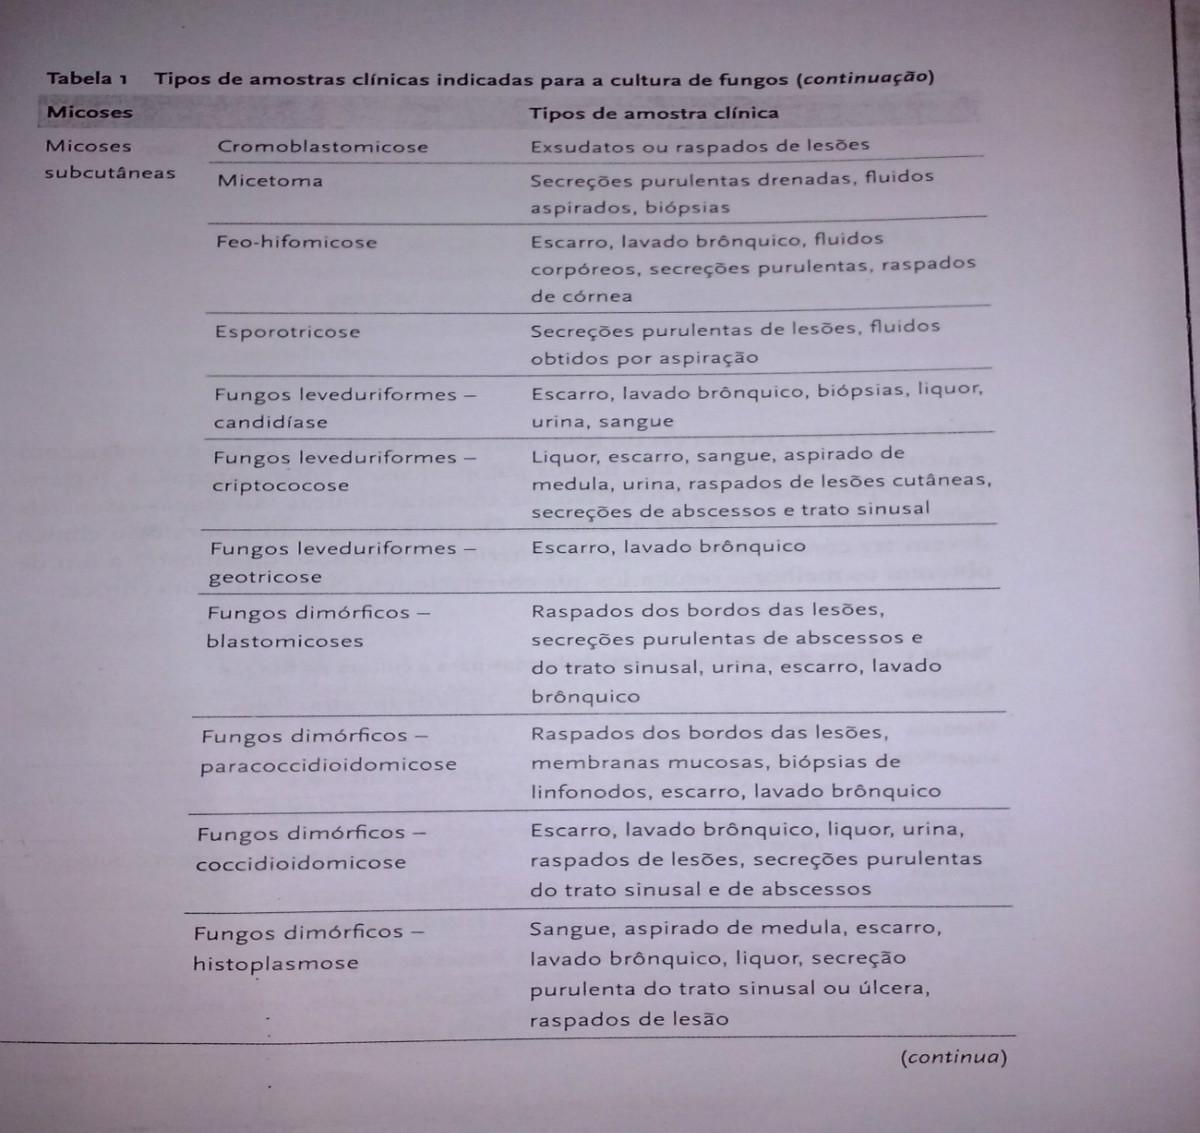 Tabela 1a fungos